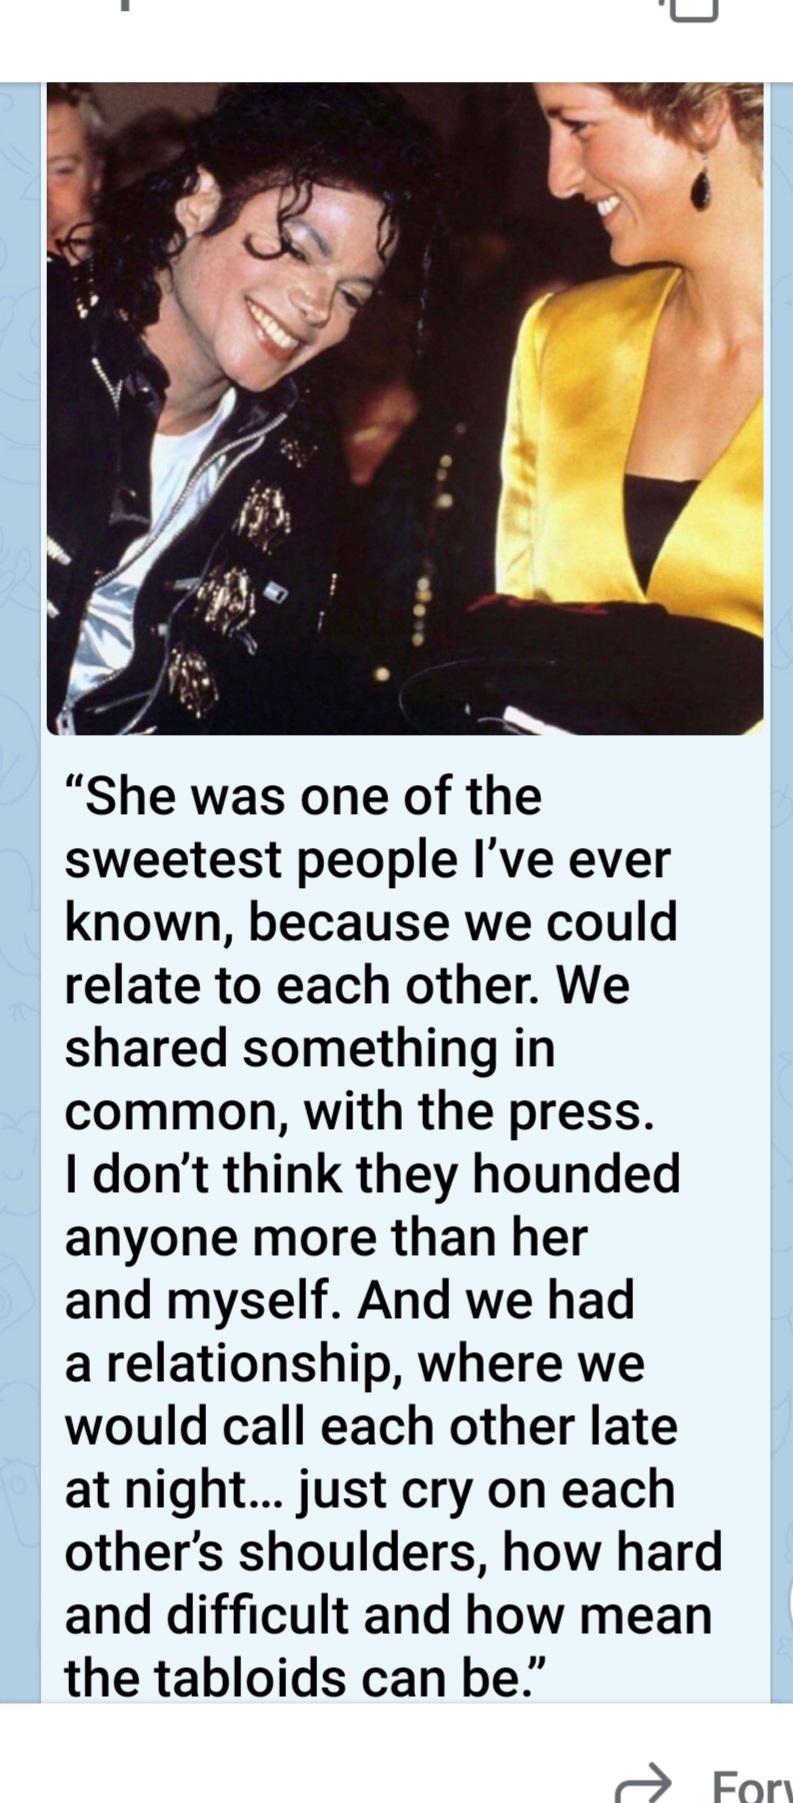 Micheal Jackson and Princess Diana